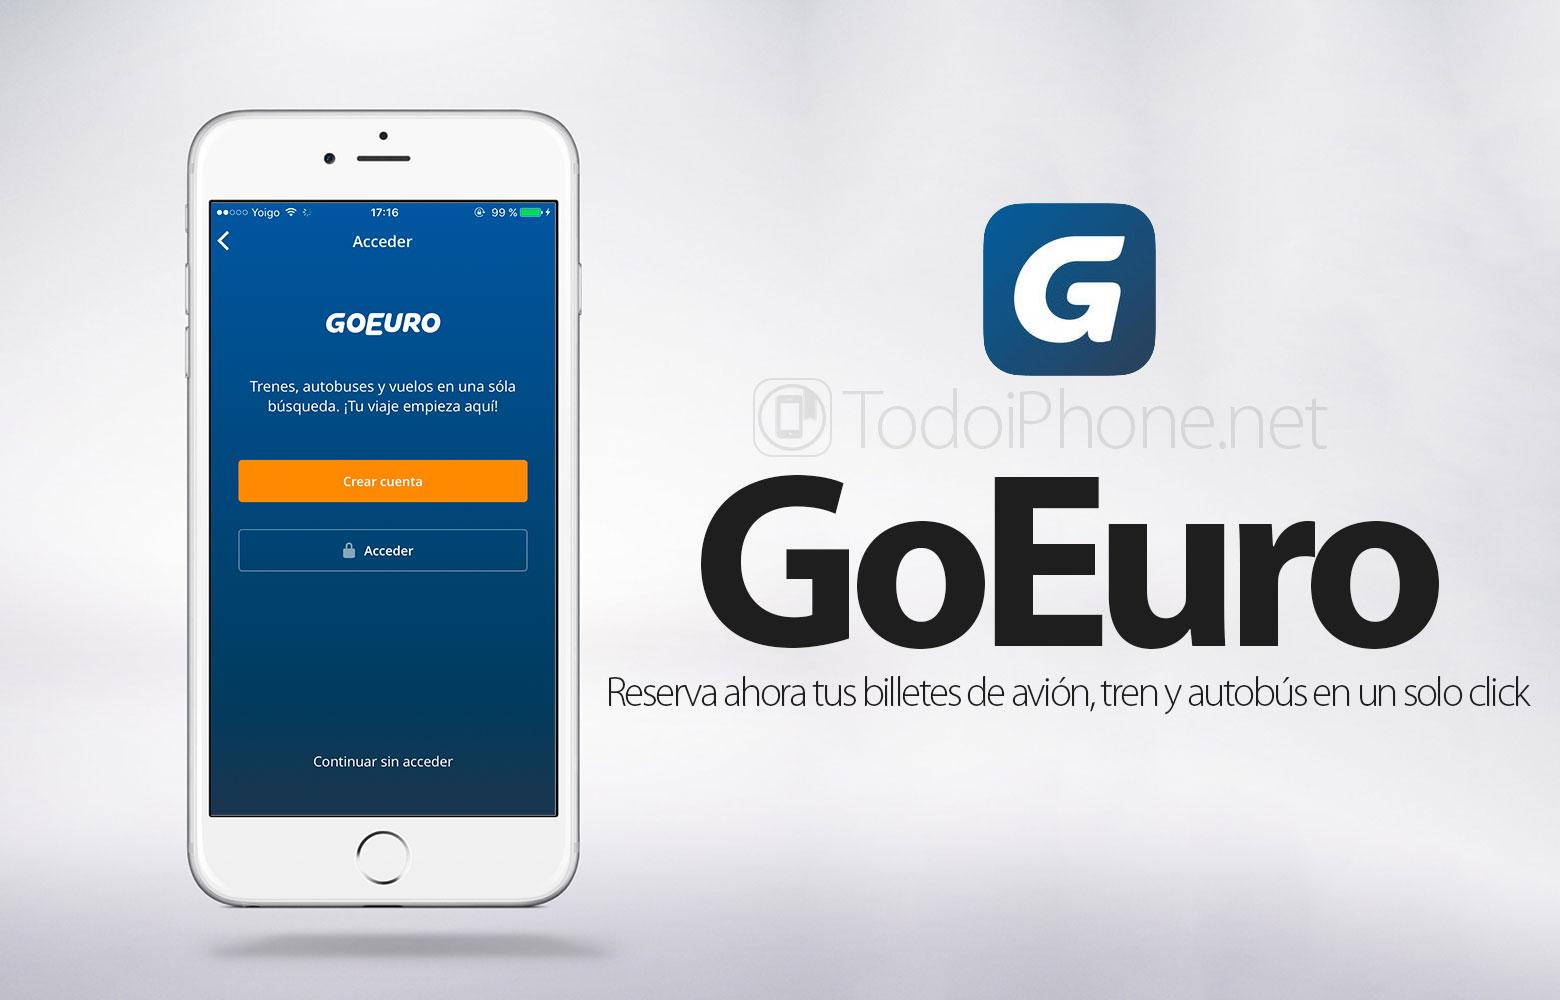 goeuro-iphone-reserva-avion-tren-autobus